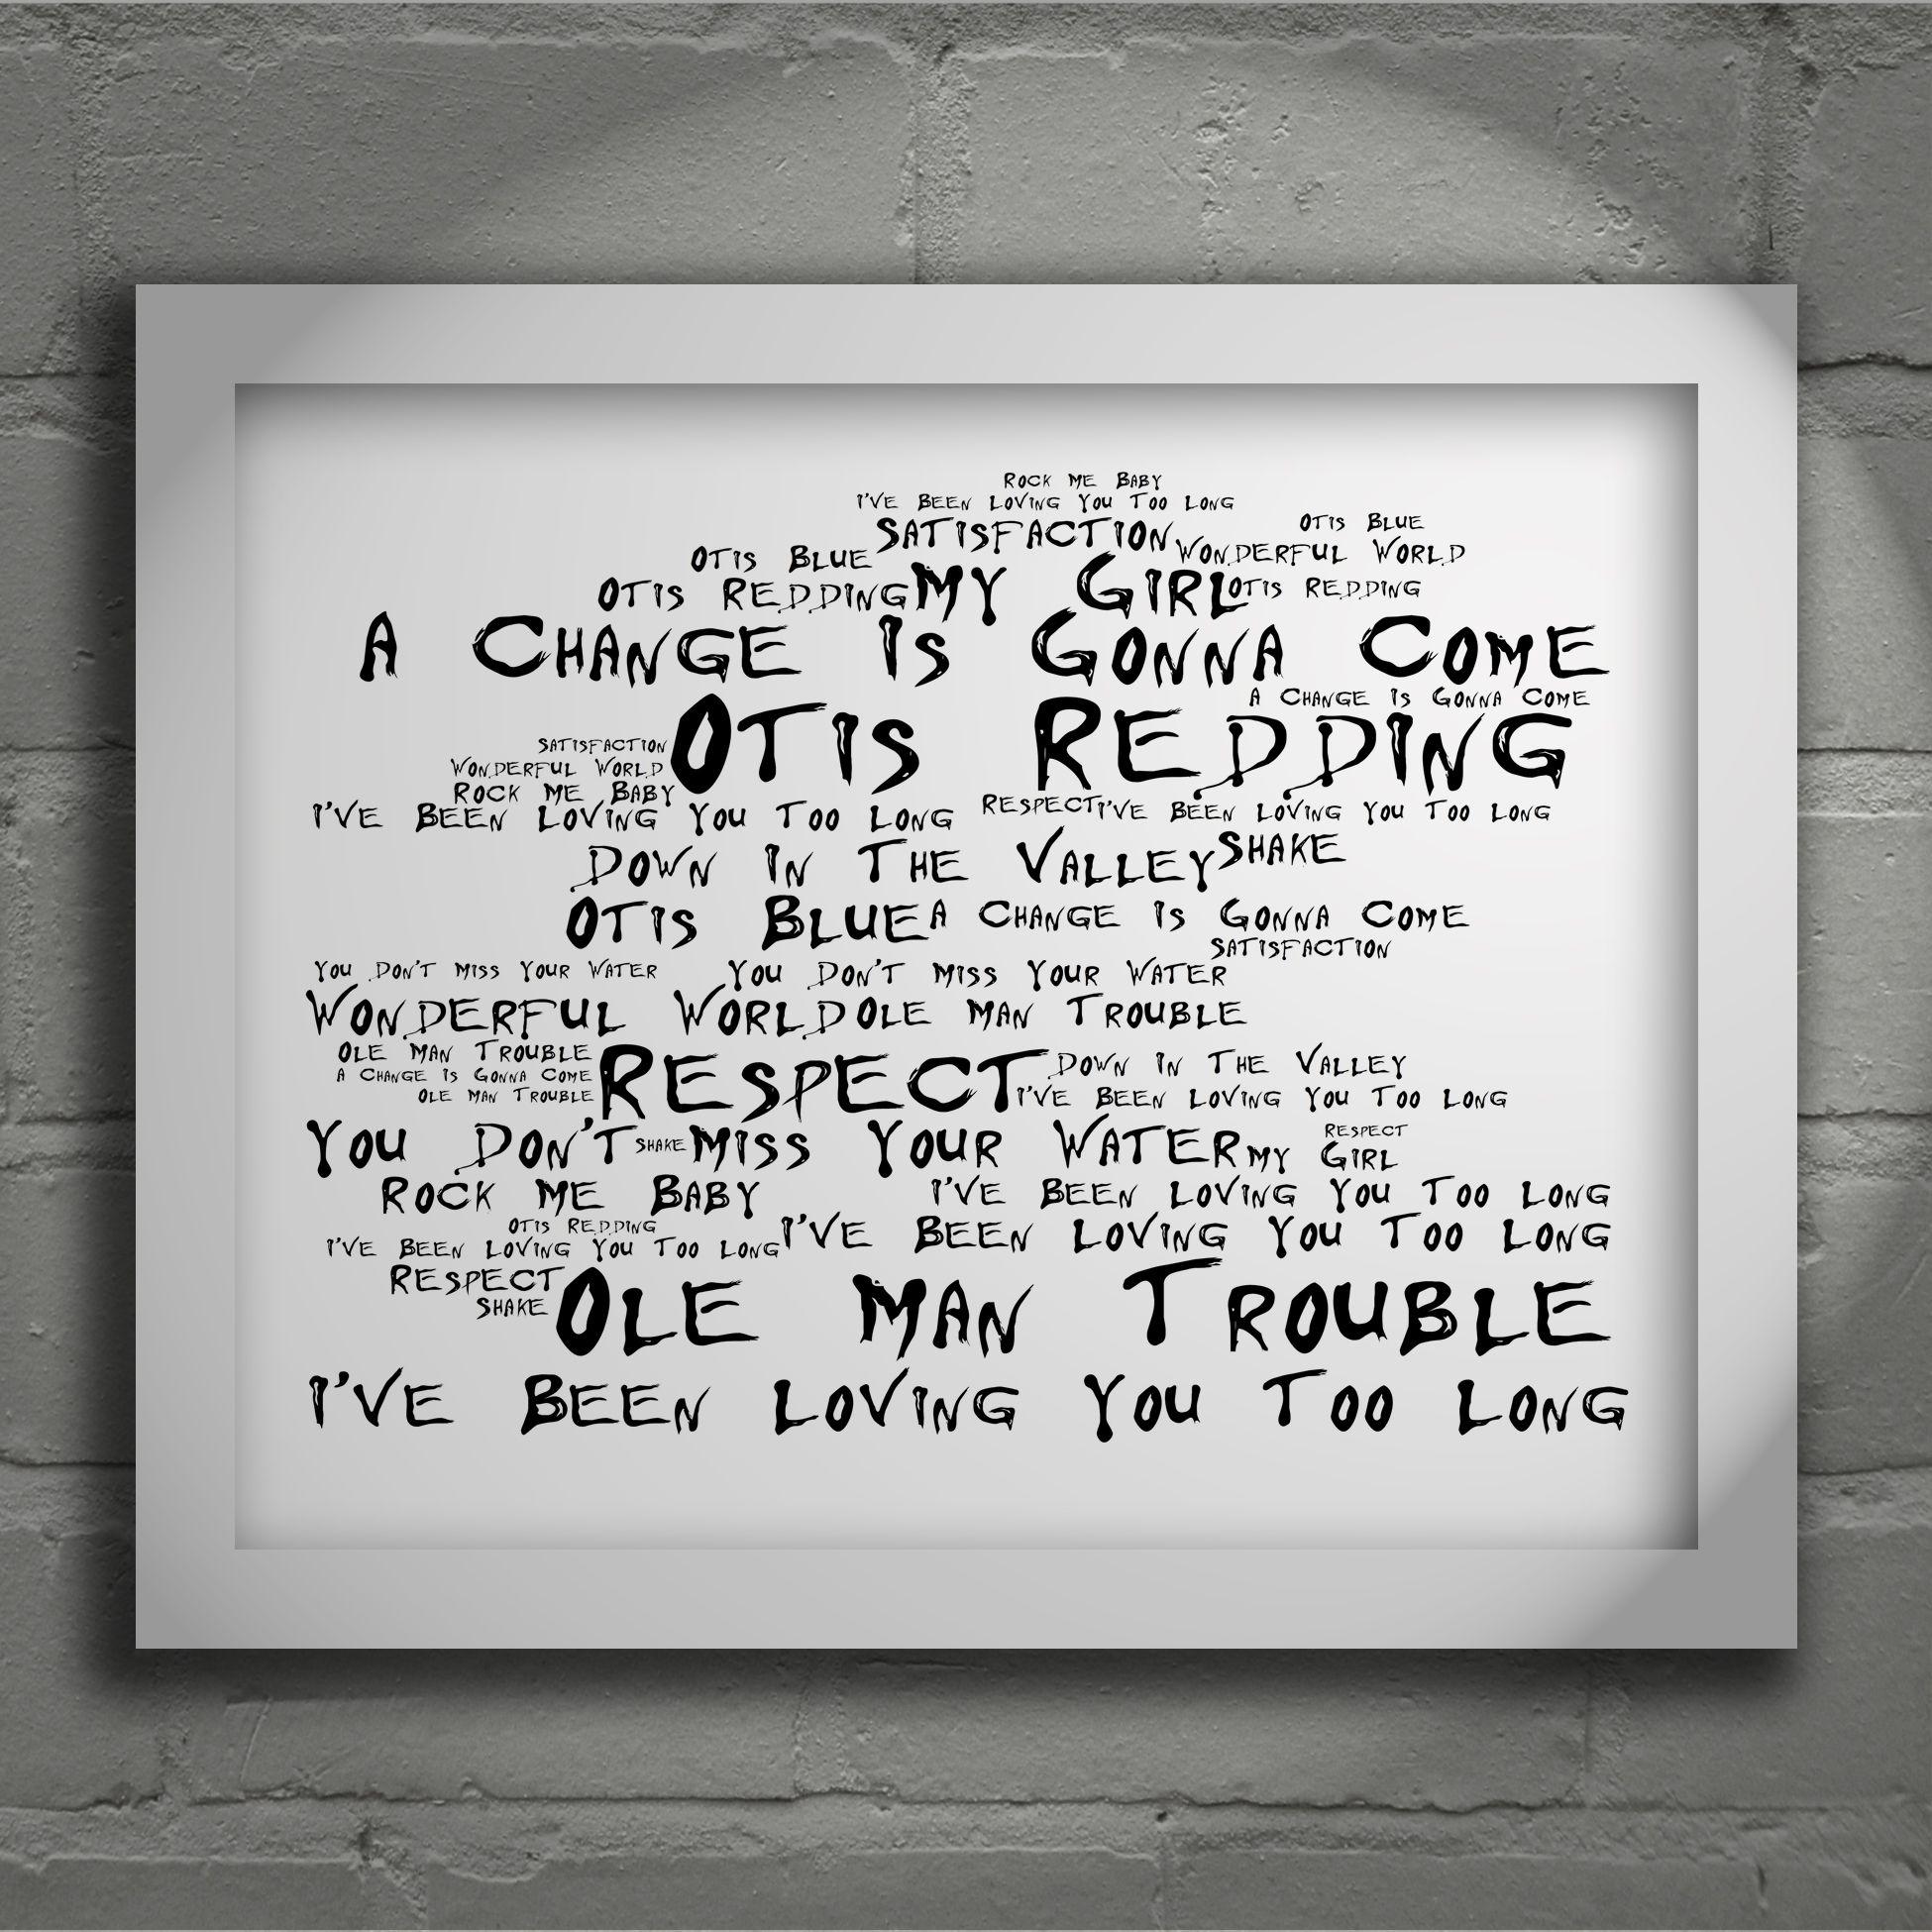 Otis redding otis blue limited edition typography lyrics art print